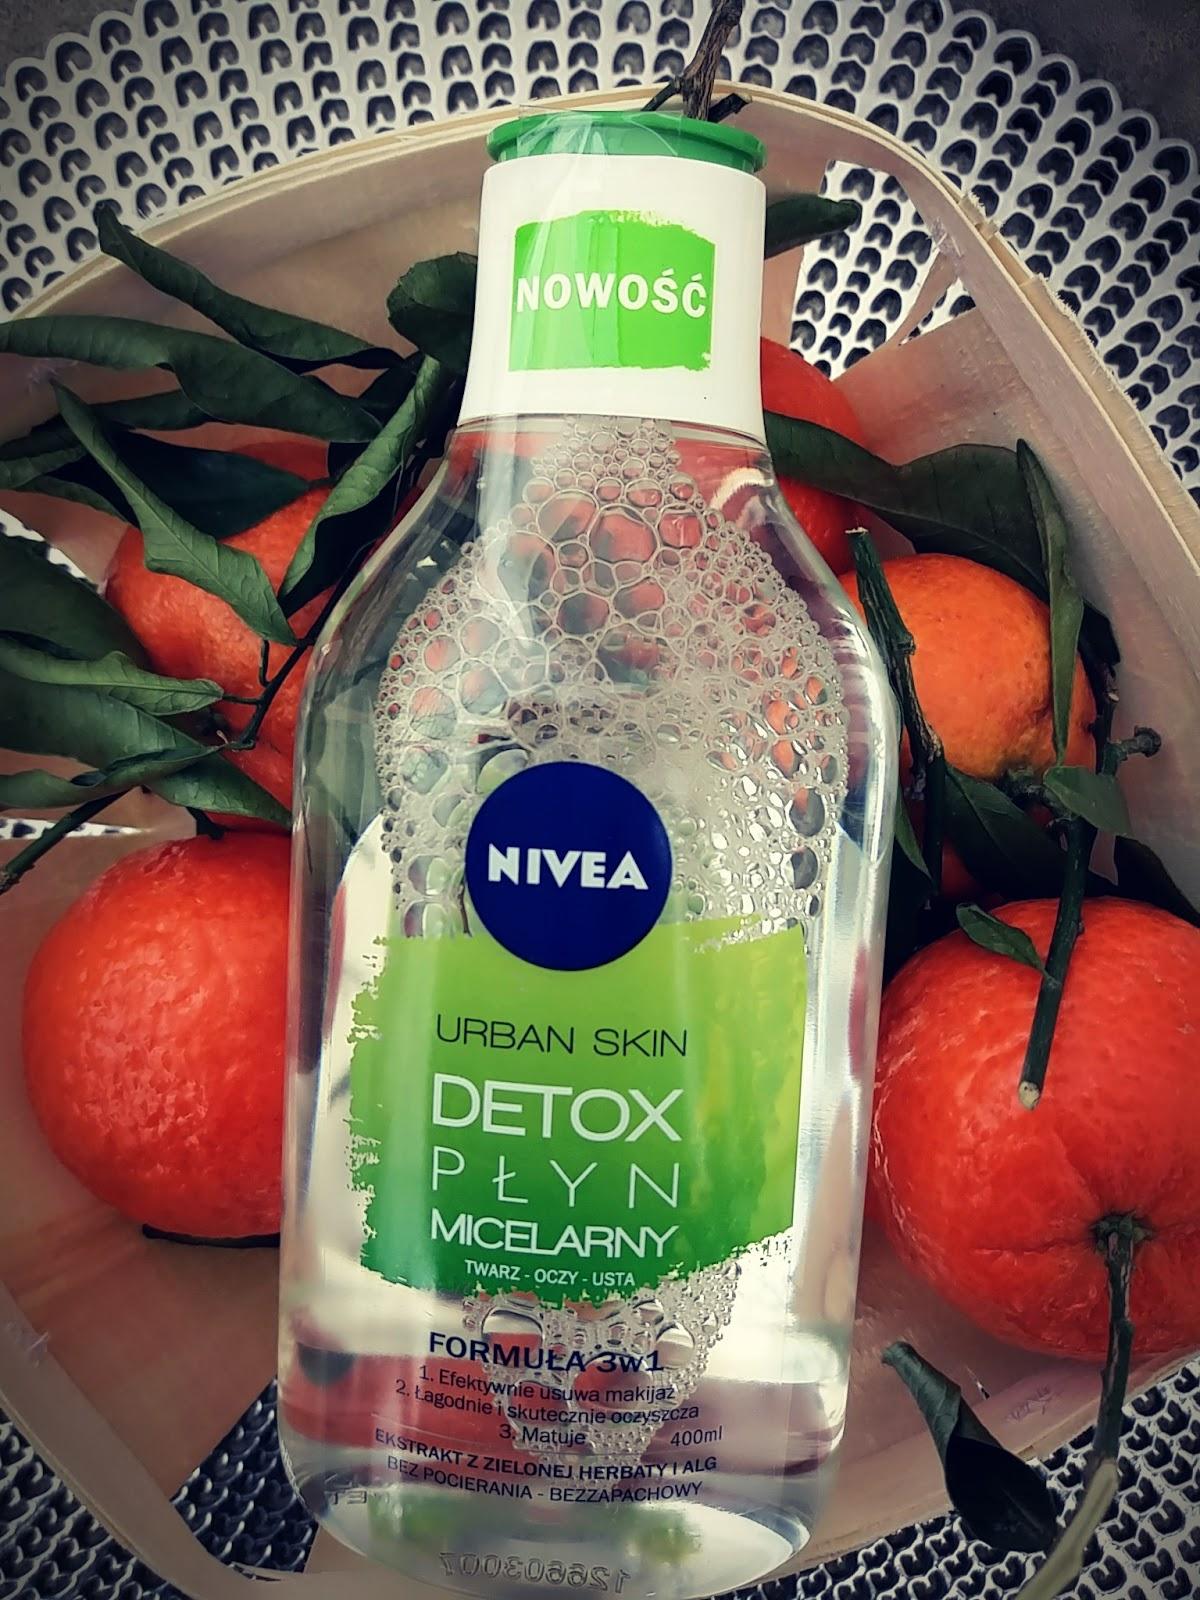 Urban Skin Detox Nivea